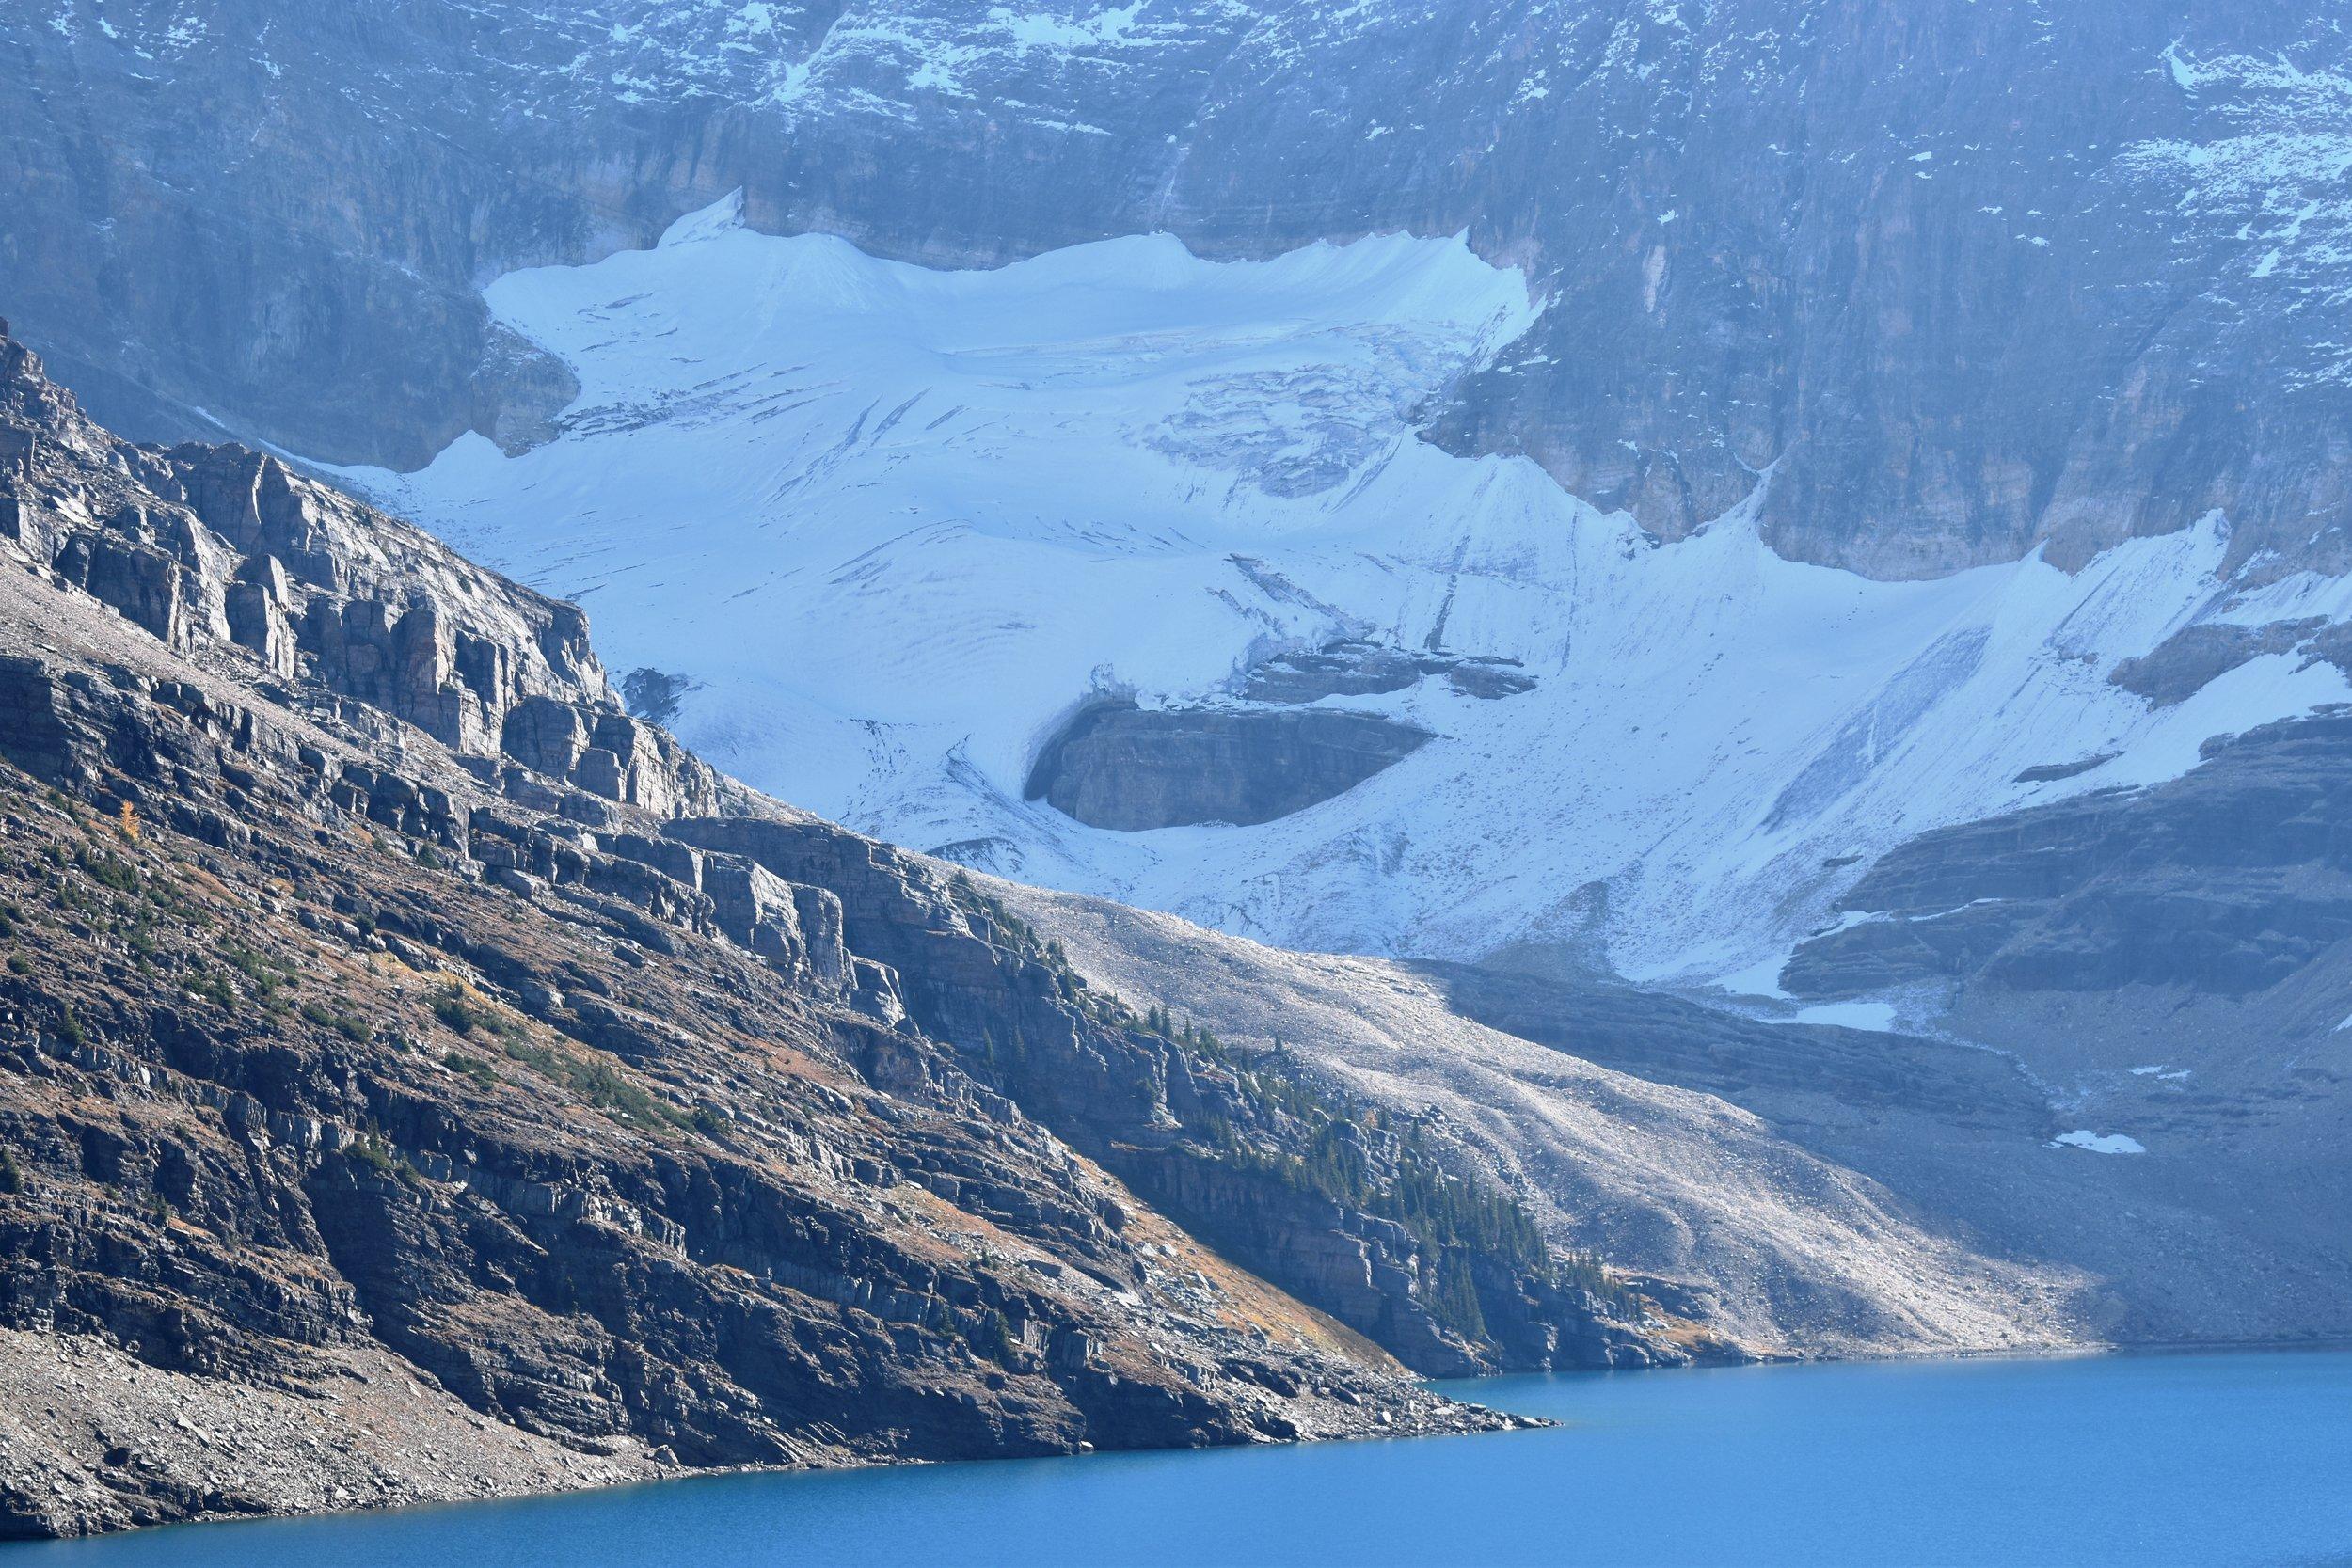 Lake McArthur and glacier